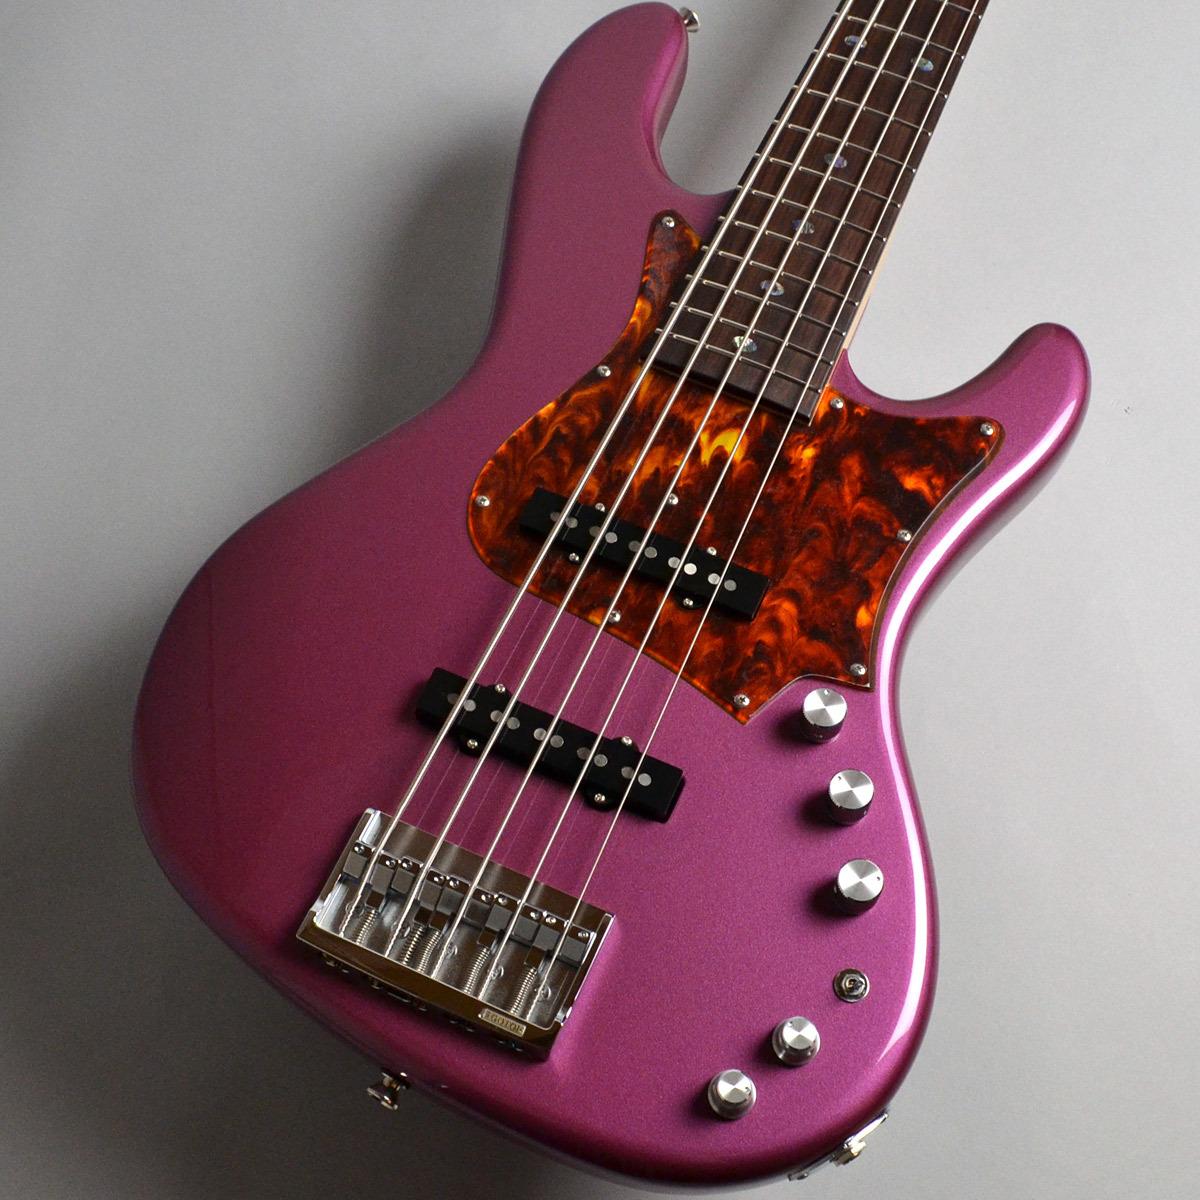 Freedom Custom Guitar Research RHINO 5st Alder/R MH Burgundy Mist 2 エレキベース(5弦) 【フリーダム】【新宿PePe店】